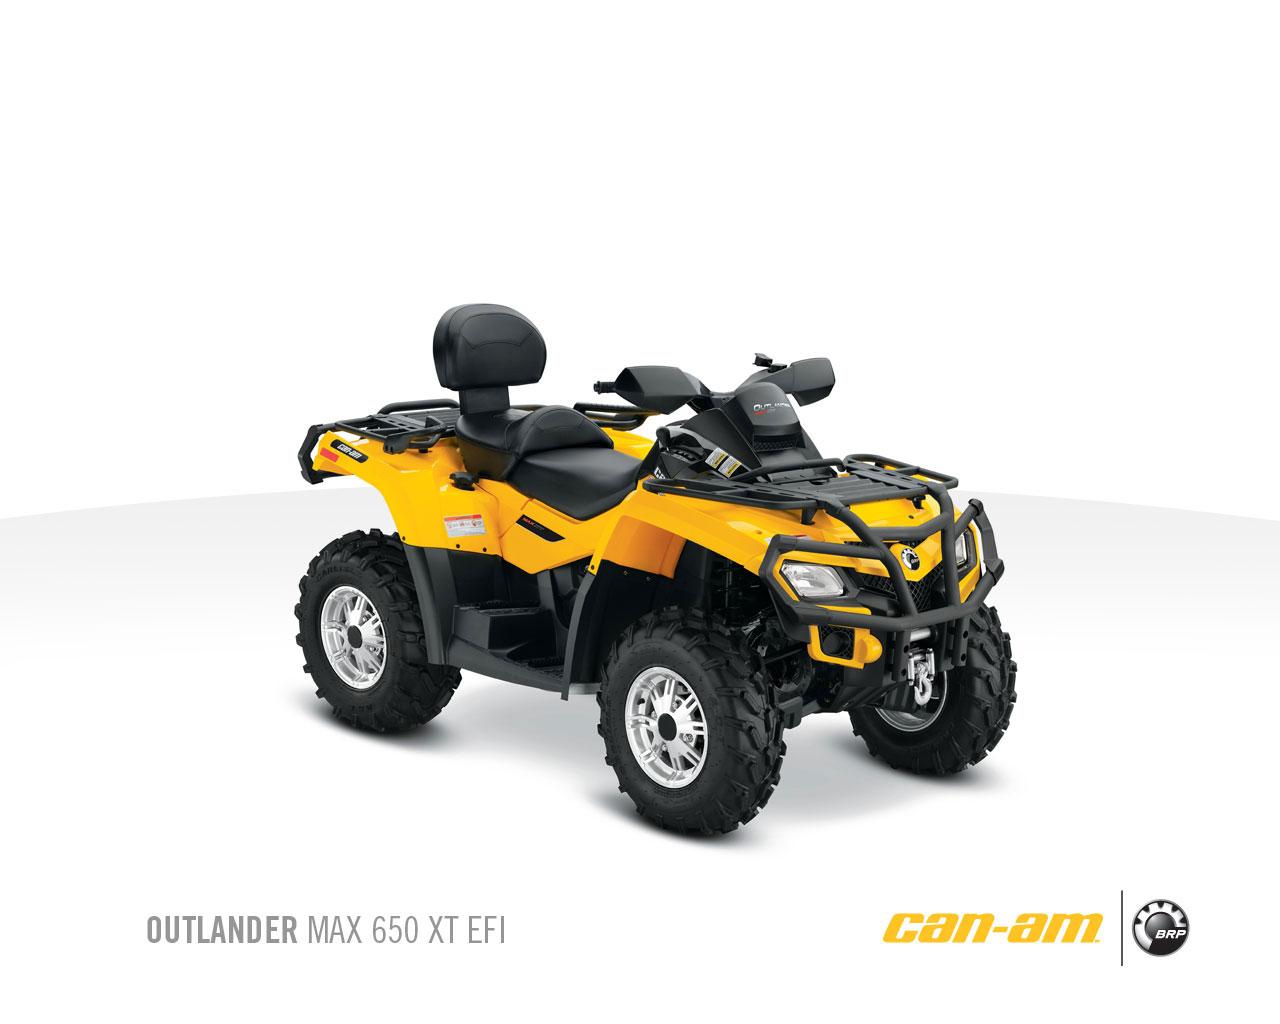 Can-am   Brp Outlander Max 650 Xt Specs - 2010  2011